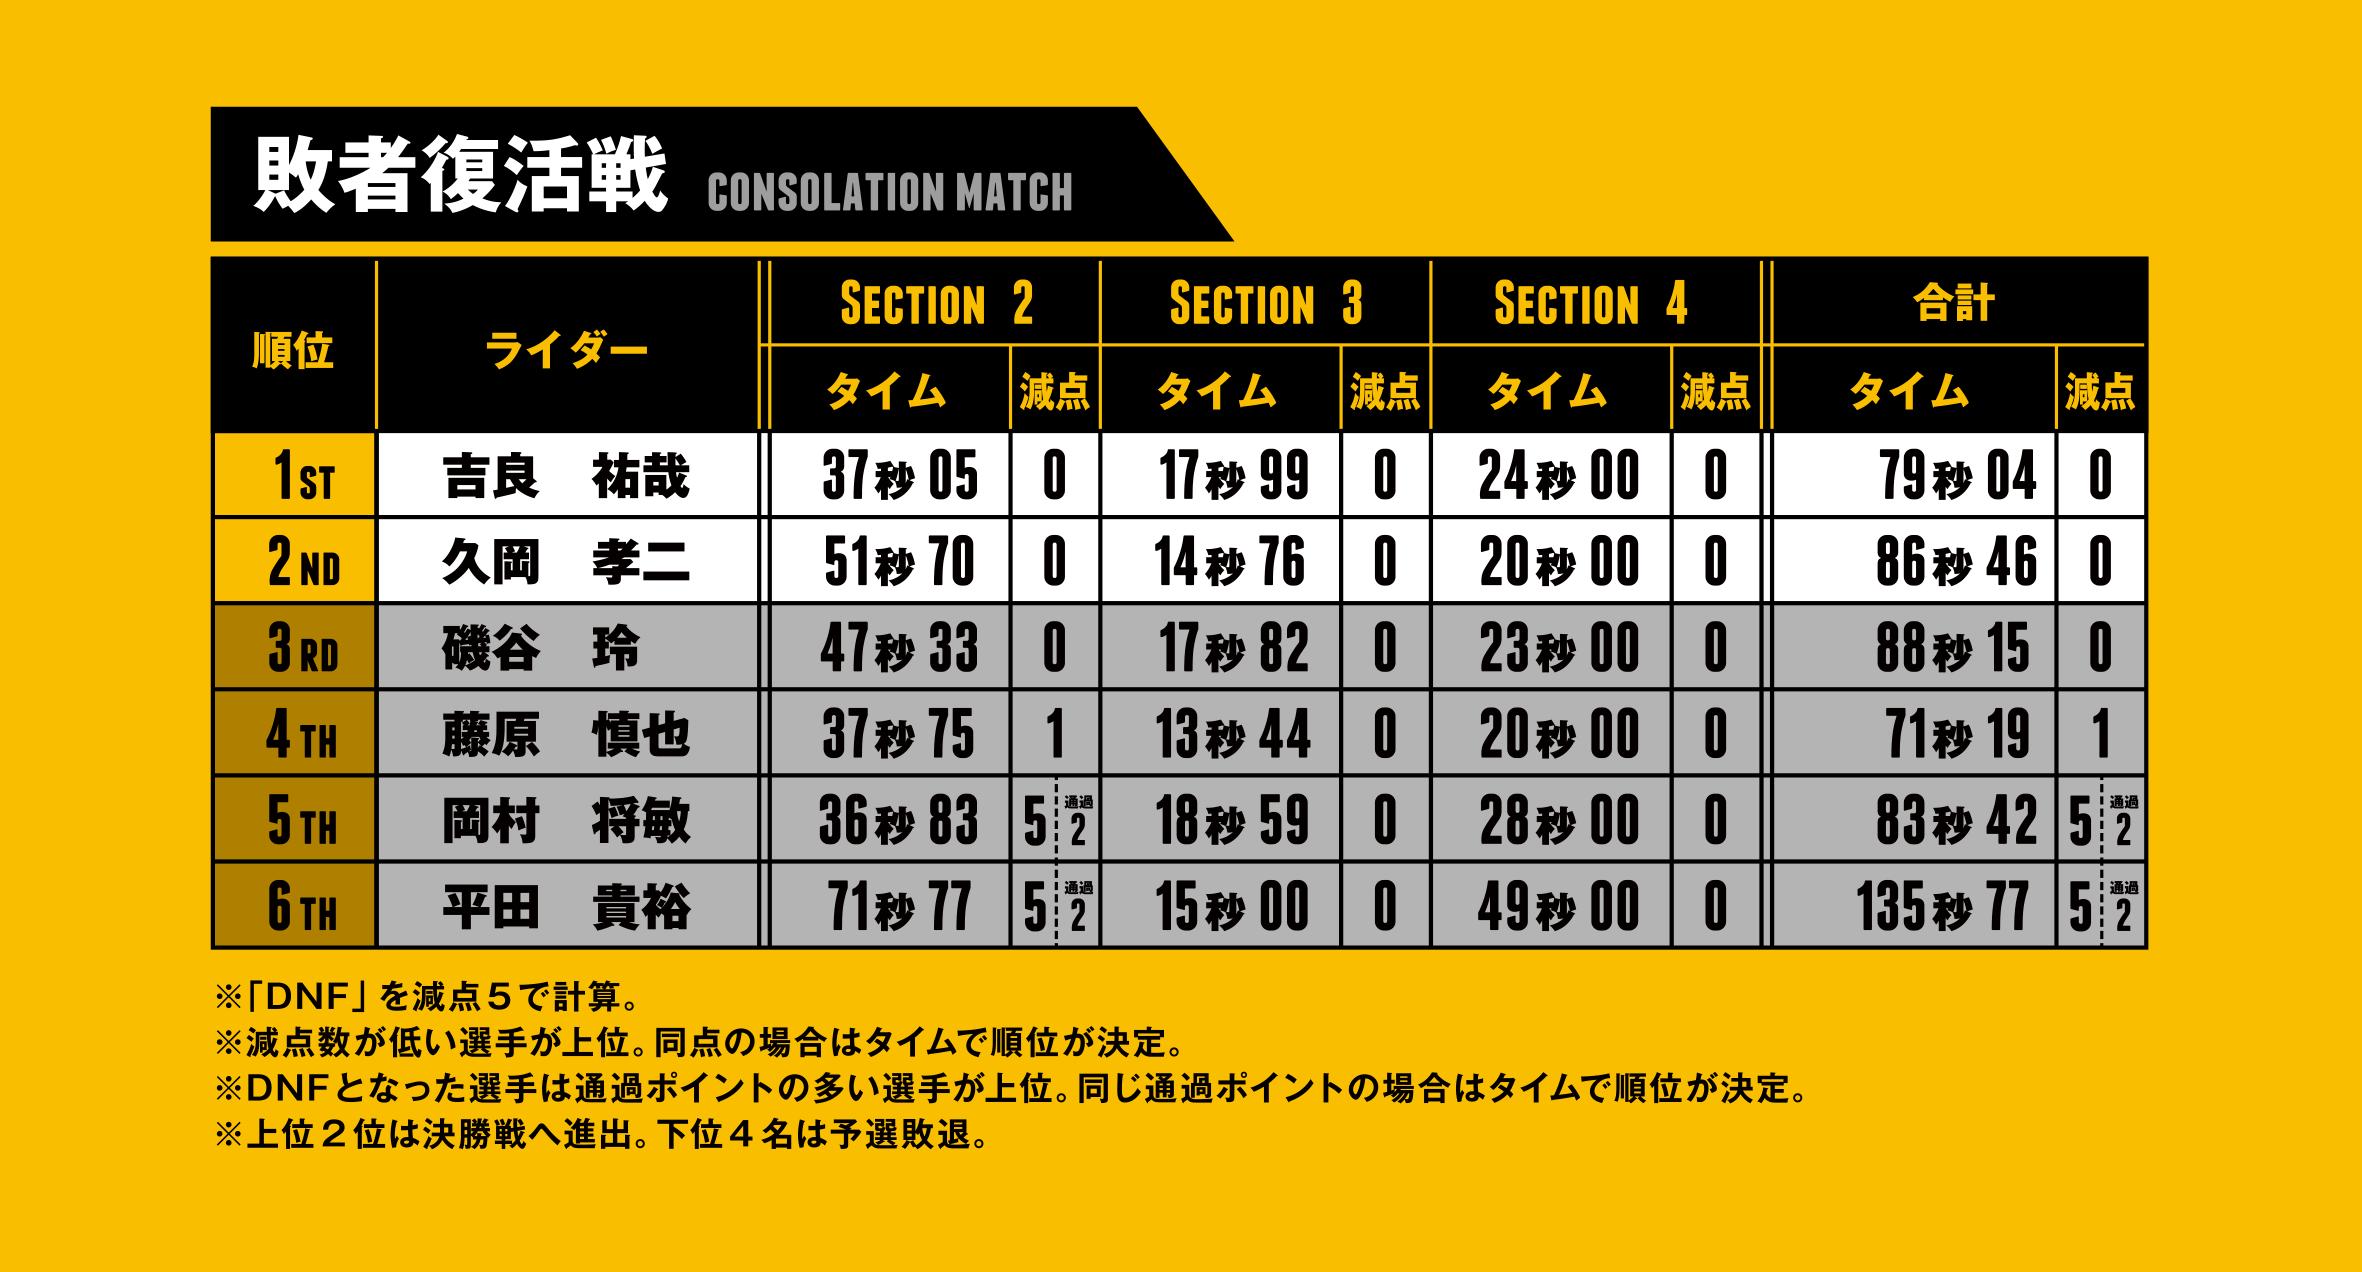 ctj2019 result consolation match